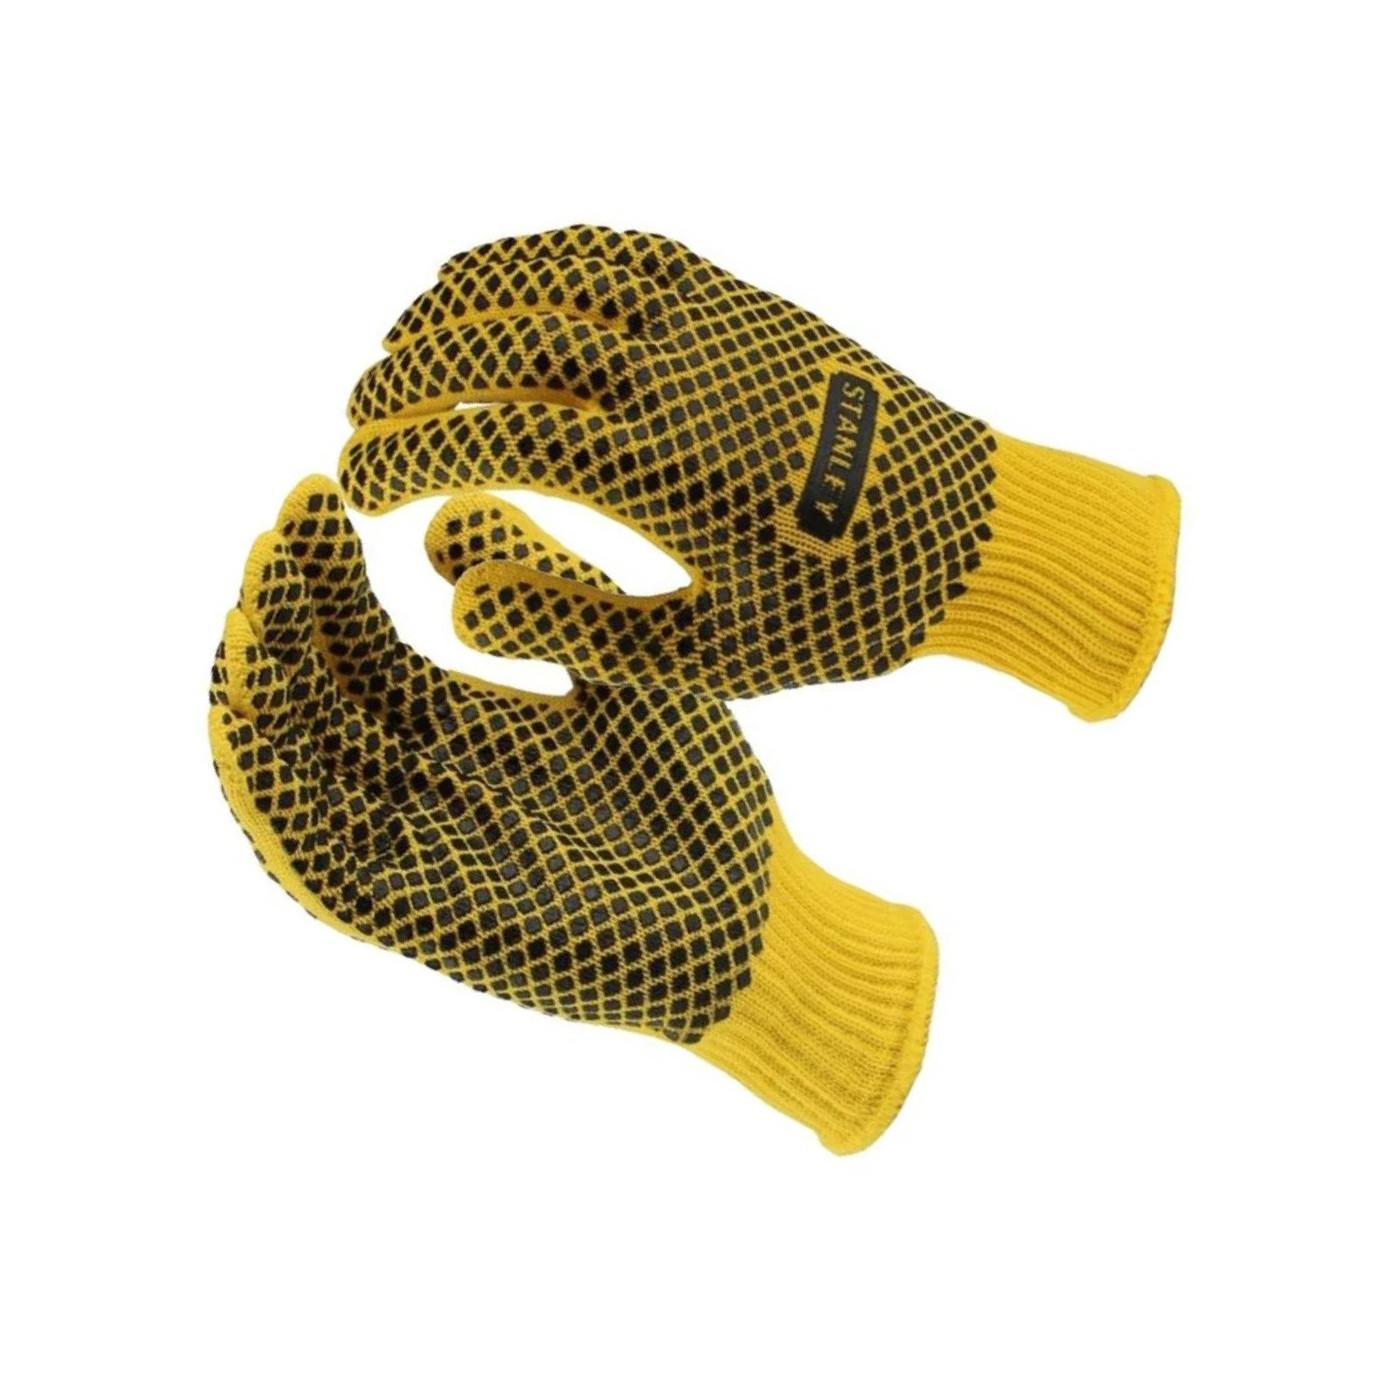 Set of Stanley work gloves (yellow / black)